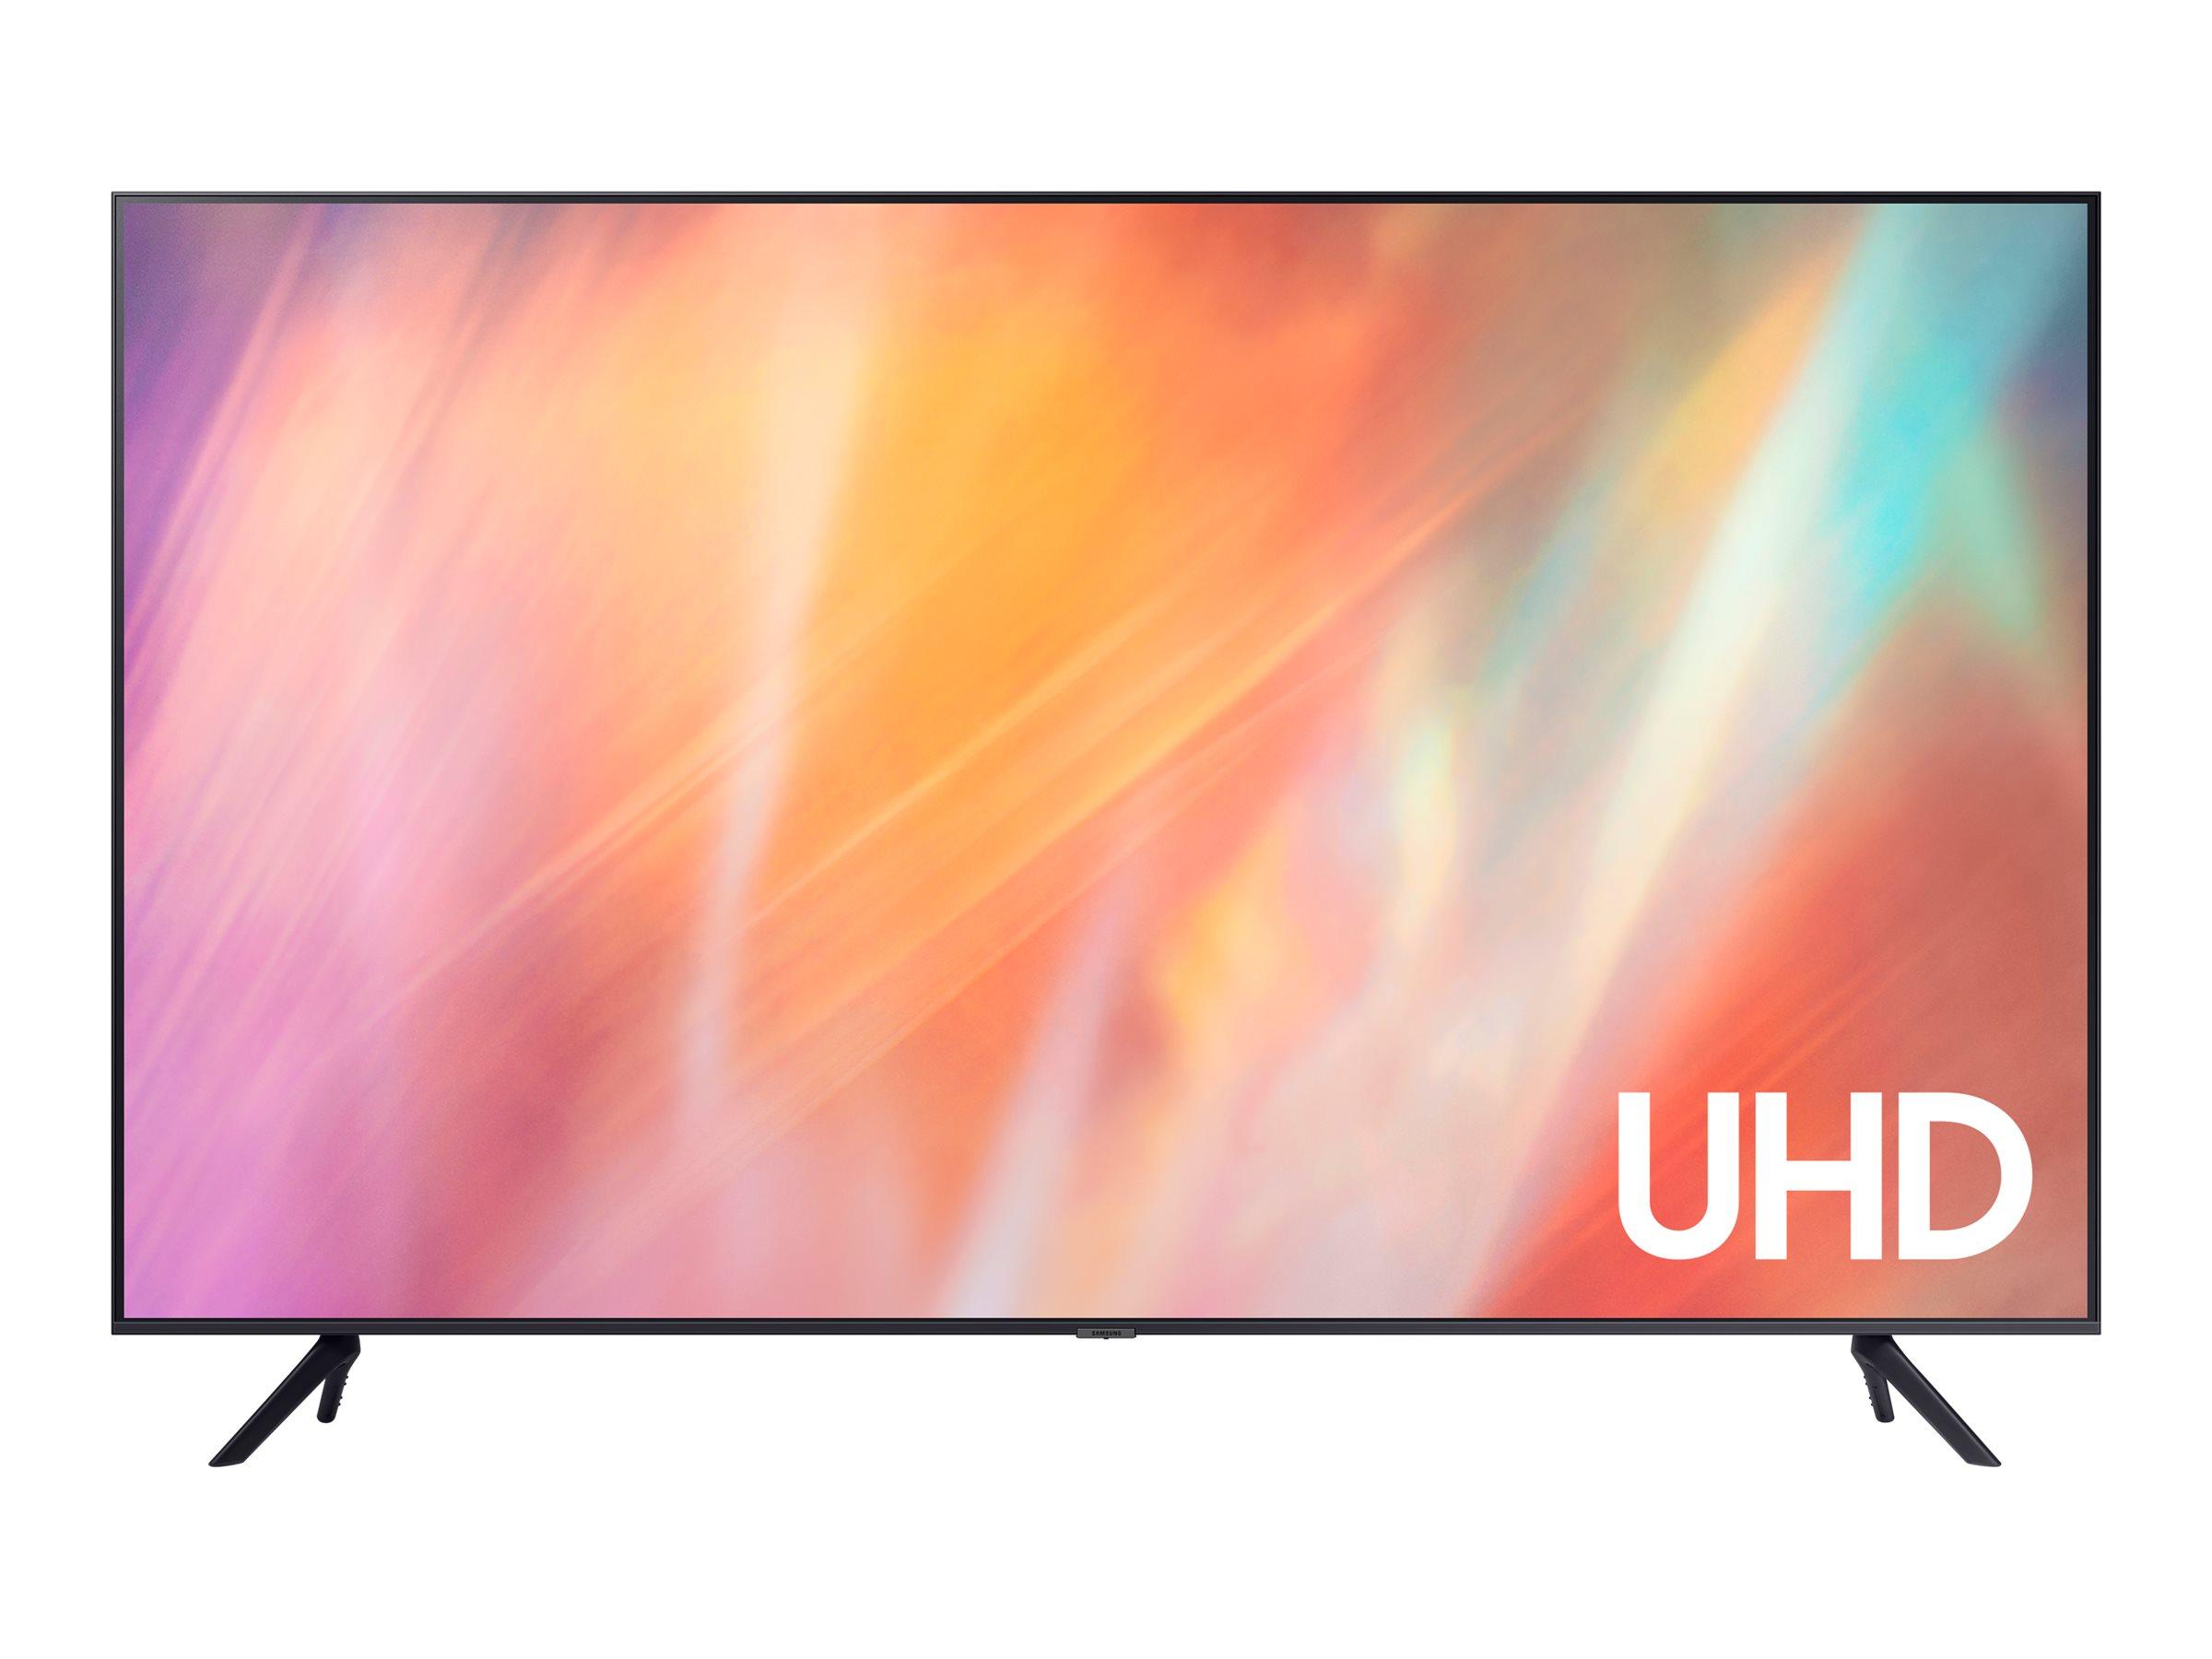 "Vorschau: Samsung BE50A-H - 125.7 cm (50"") Diagonalklasse BEA-H Series LCD-TV mit LED-Hintergrundbeleuchtung - Digital Signage - Smart TV - Tizen OS - 4K UHD (2160p)"